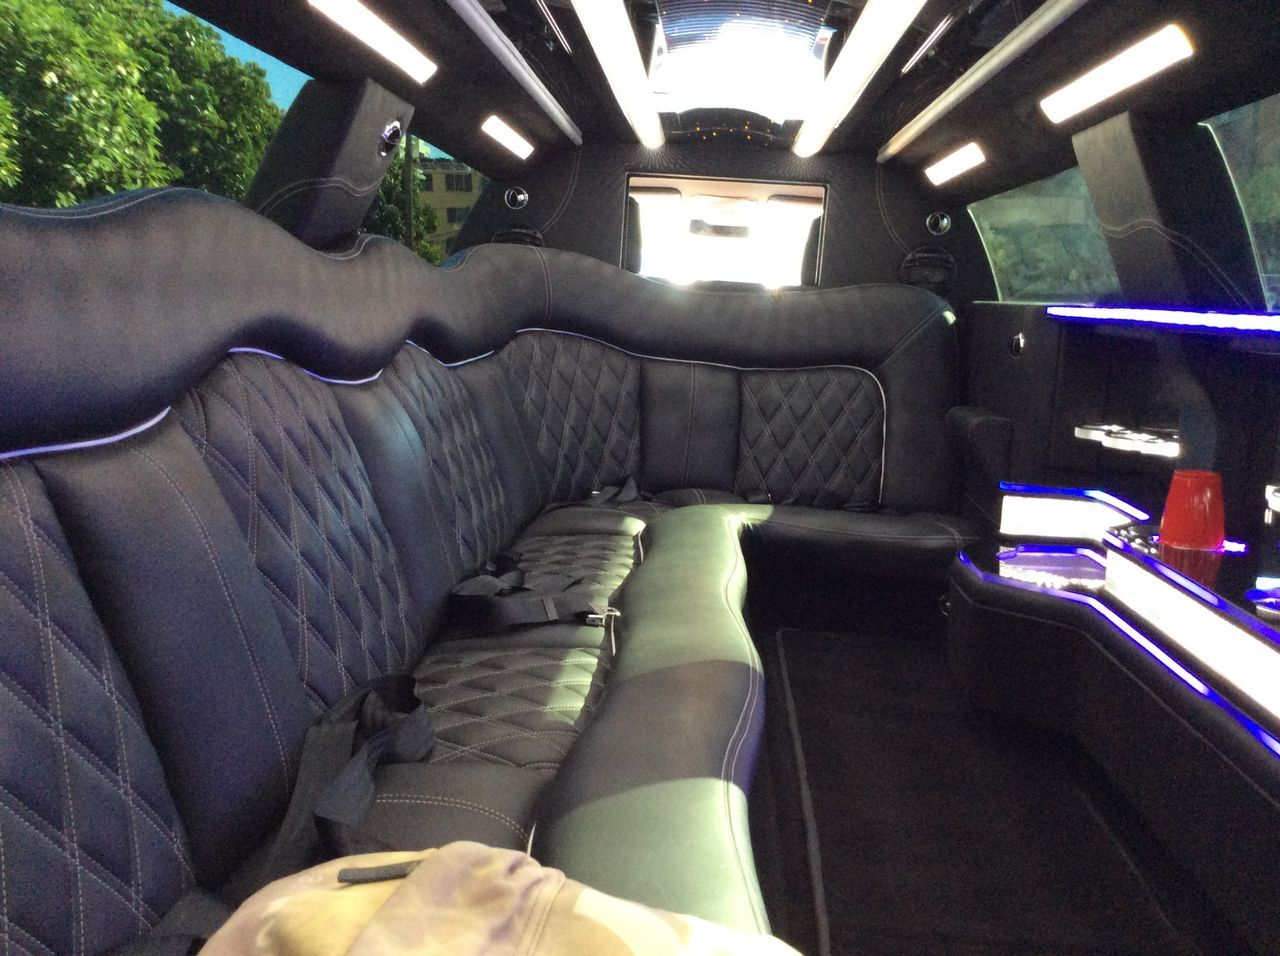 vehicle interior, transportation, vehicle seat, indoors, mode of transport, illuminated, seat, no people, day